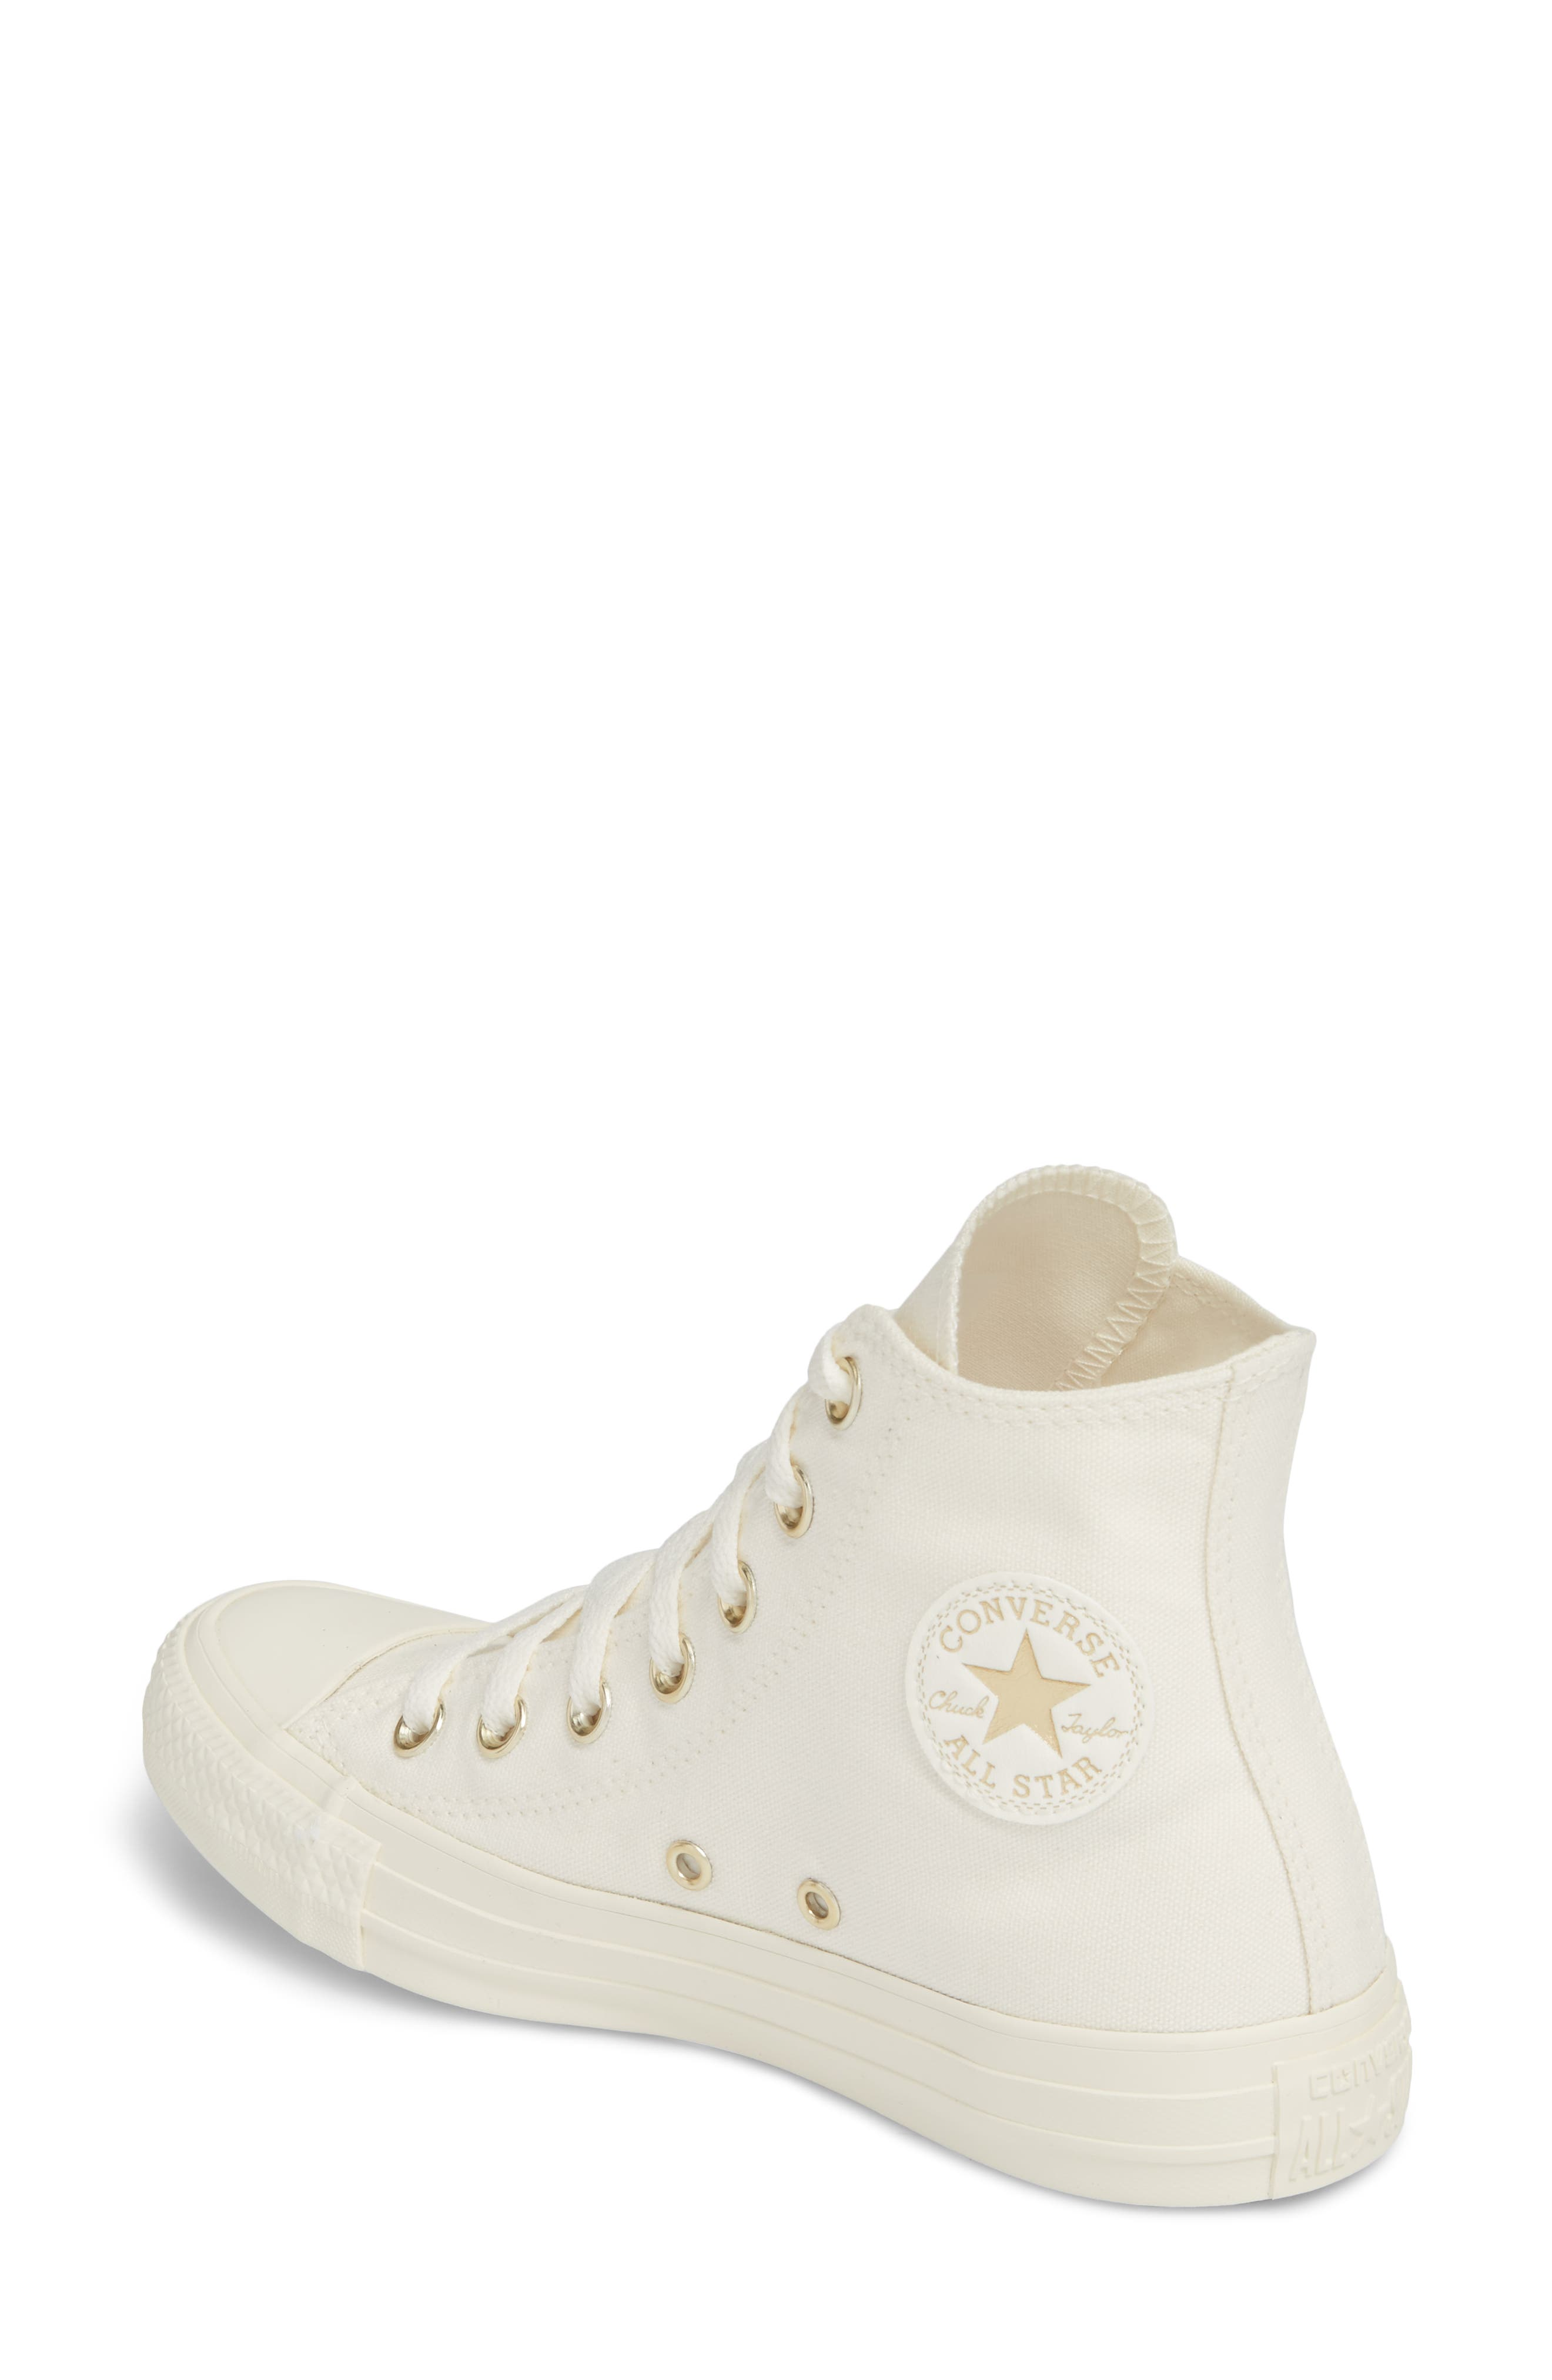 Chuck Taylor<sup>®</sup> All Star<sup>®</sup> Hi Sneaker,                             Alternate thumbnail 2, color,                             Egret